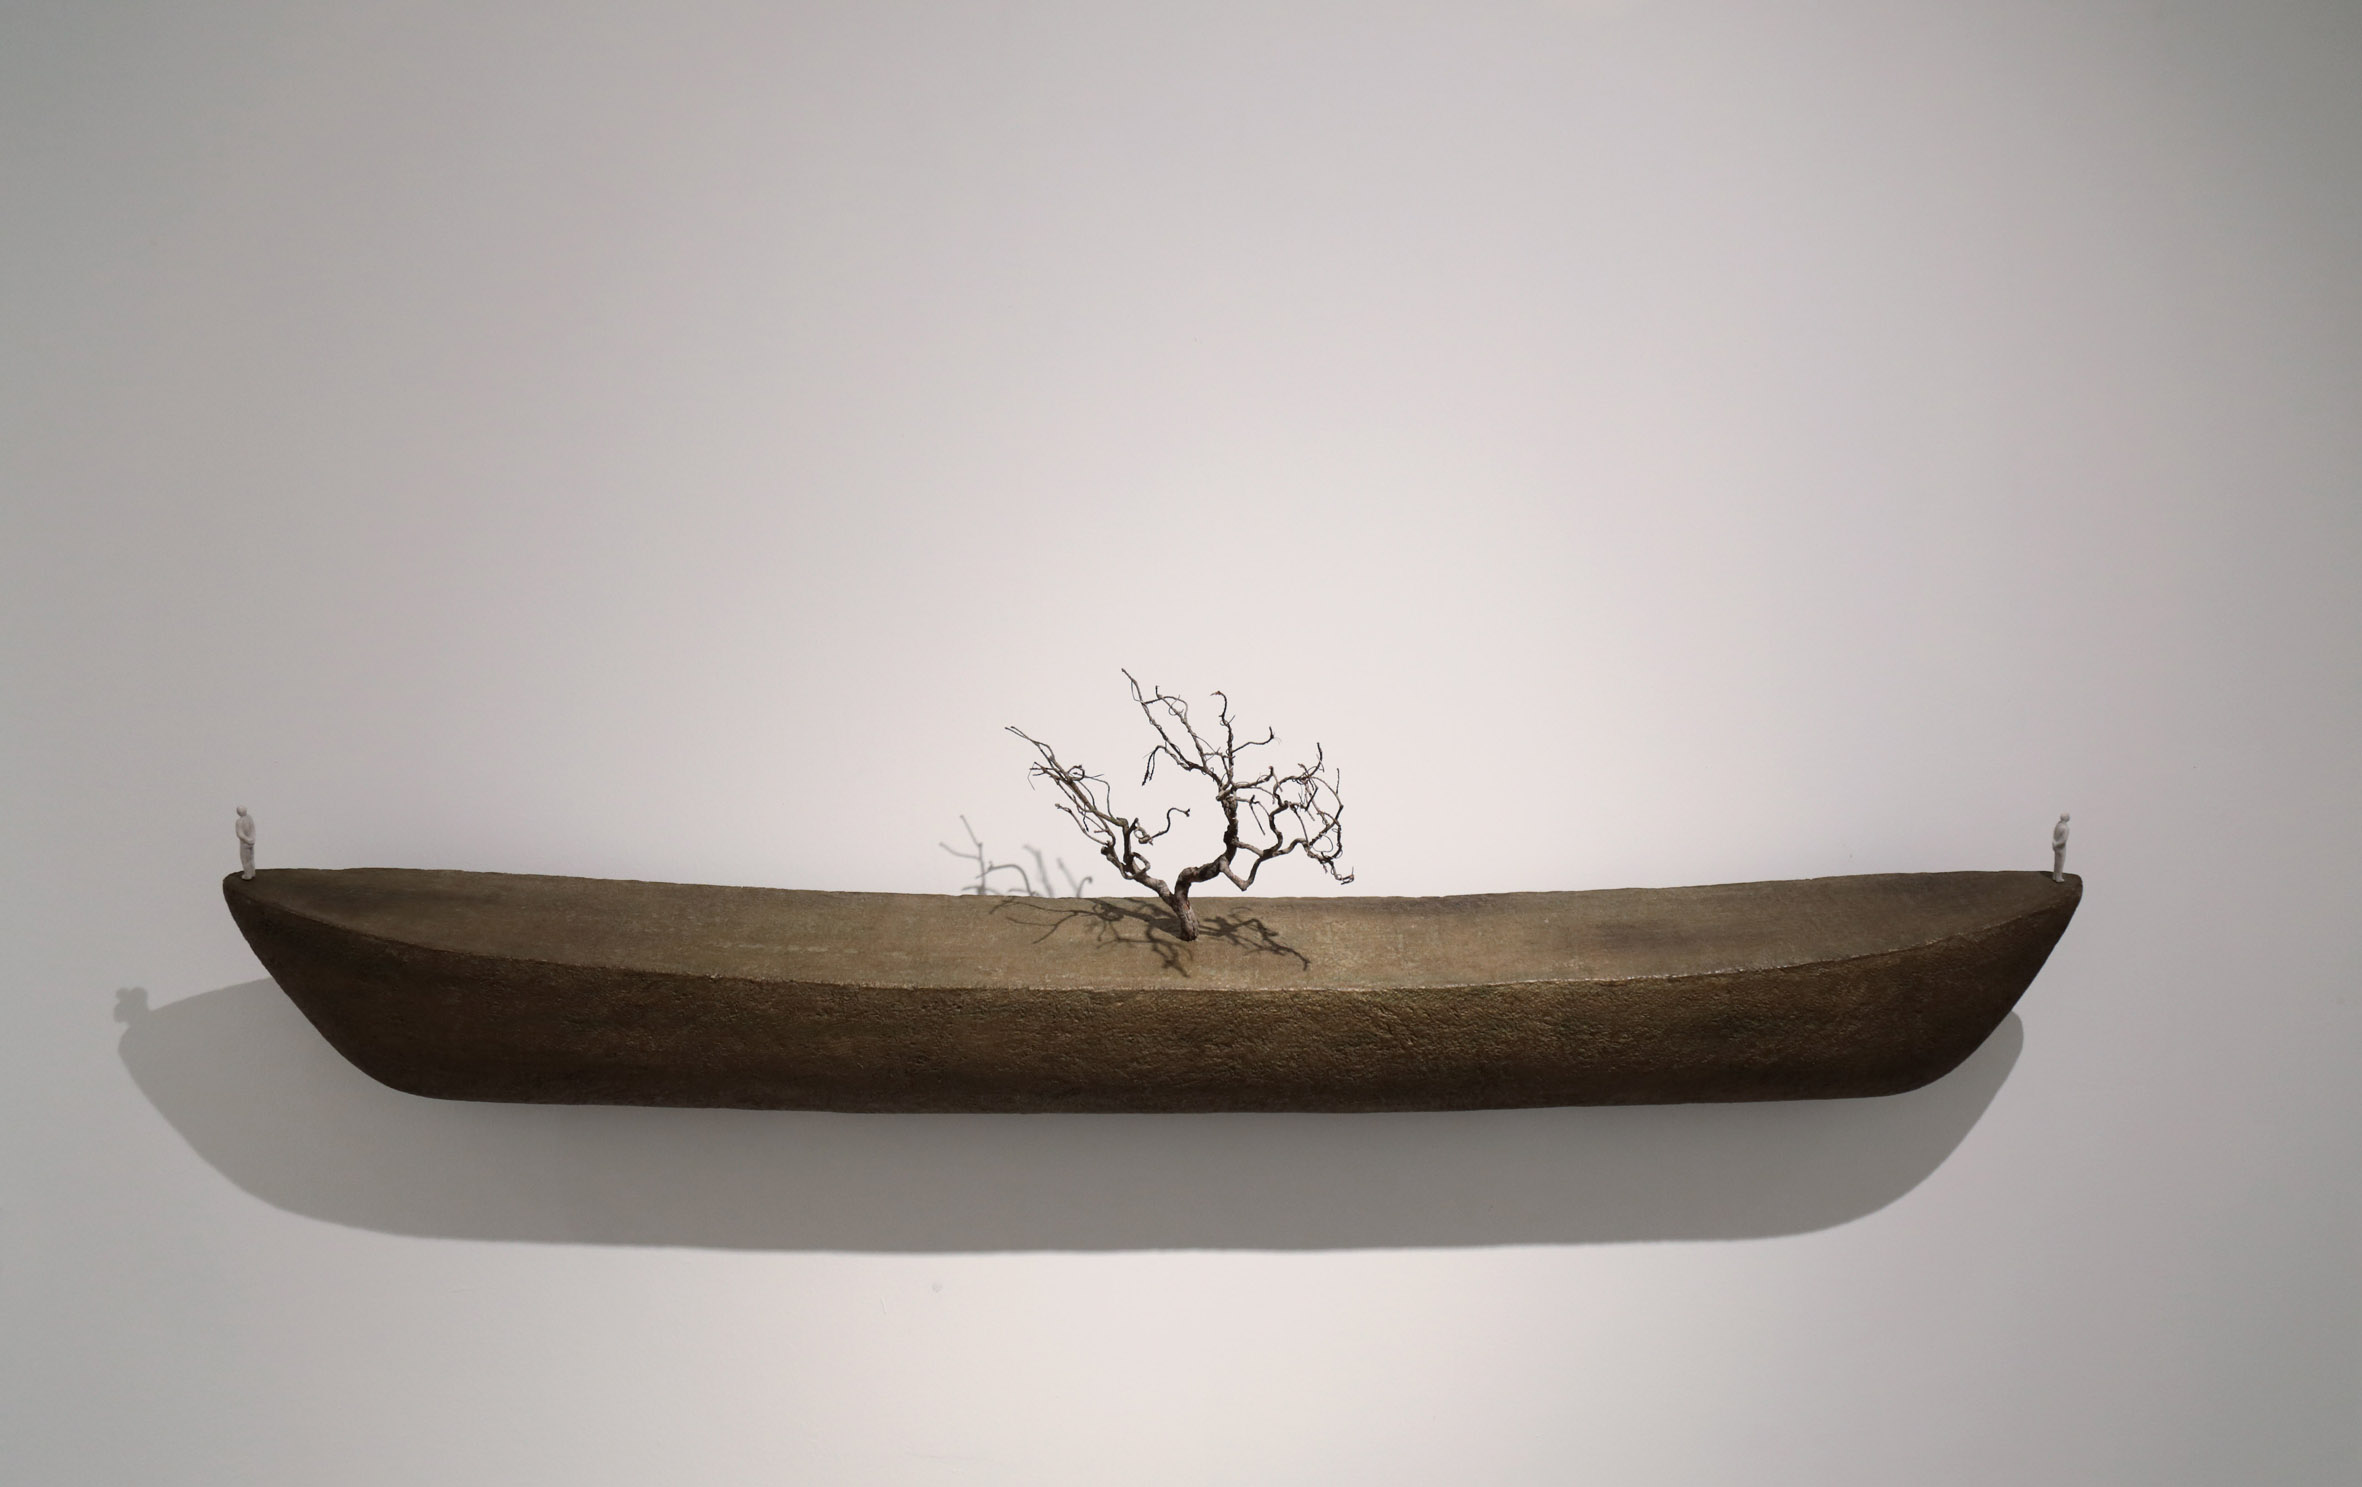 Amir Sharifpour - Albero errante, 2016, tecnica mista, cm 160x40x20